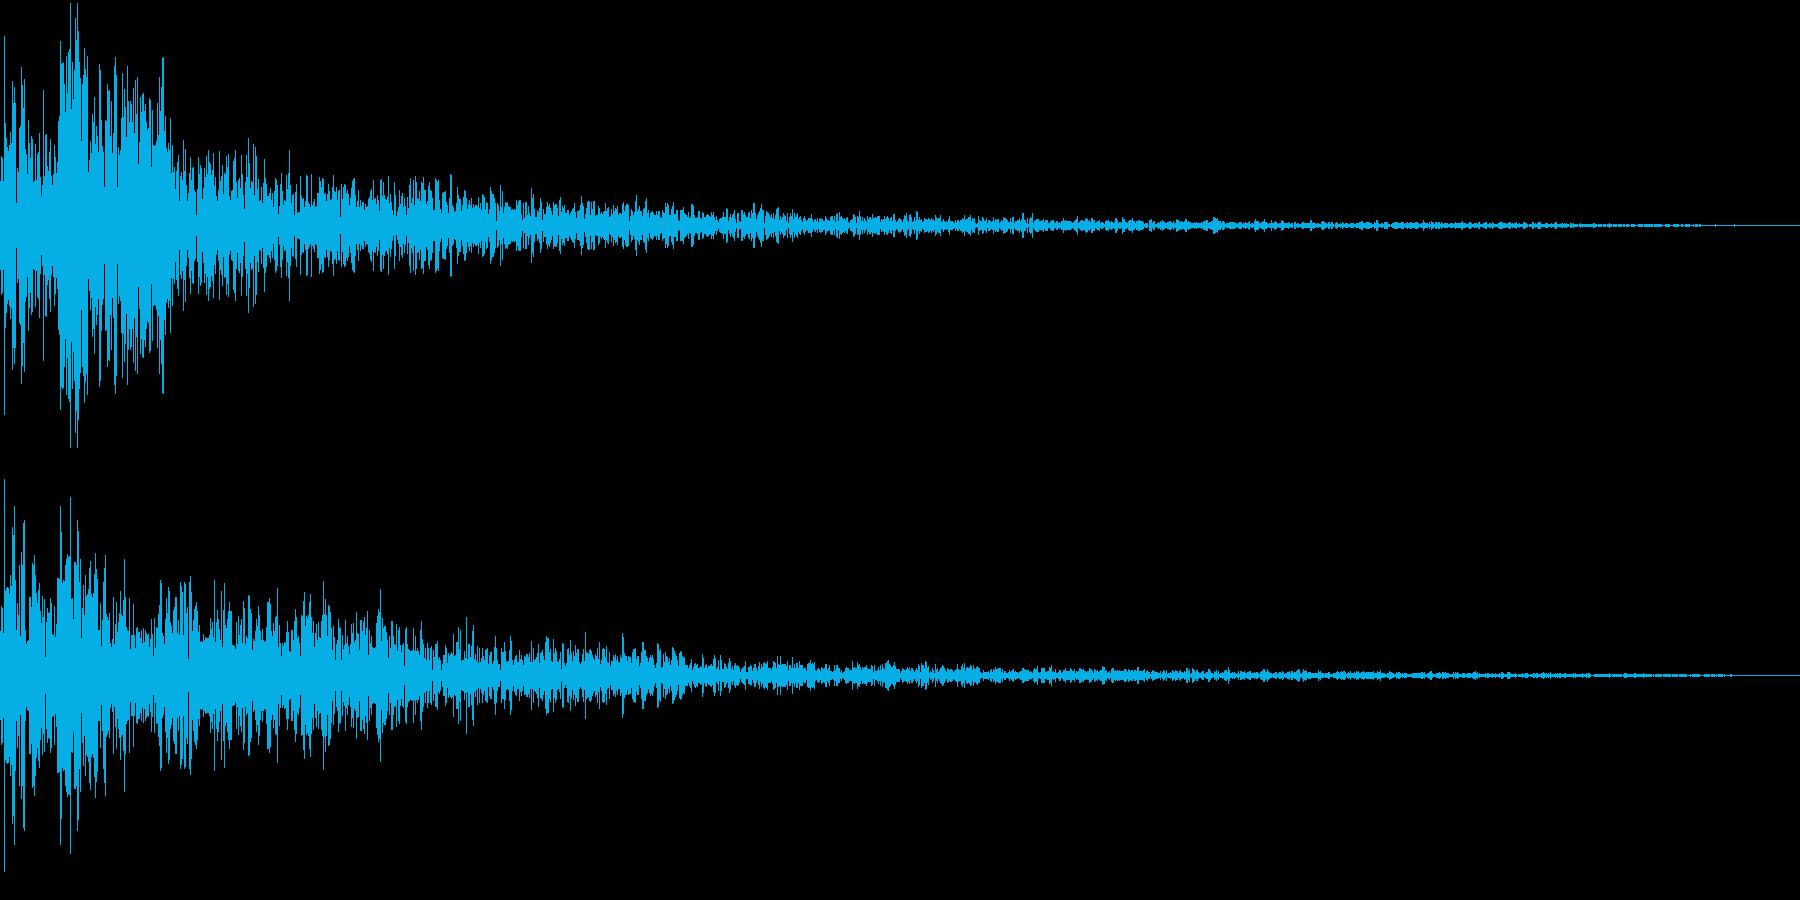 Taiko 開始の合図 和太鼓 残響深めの再生済みの波形